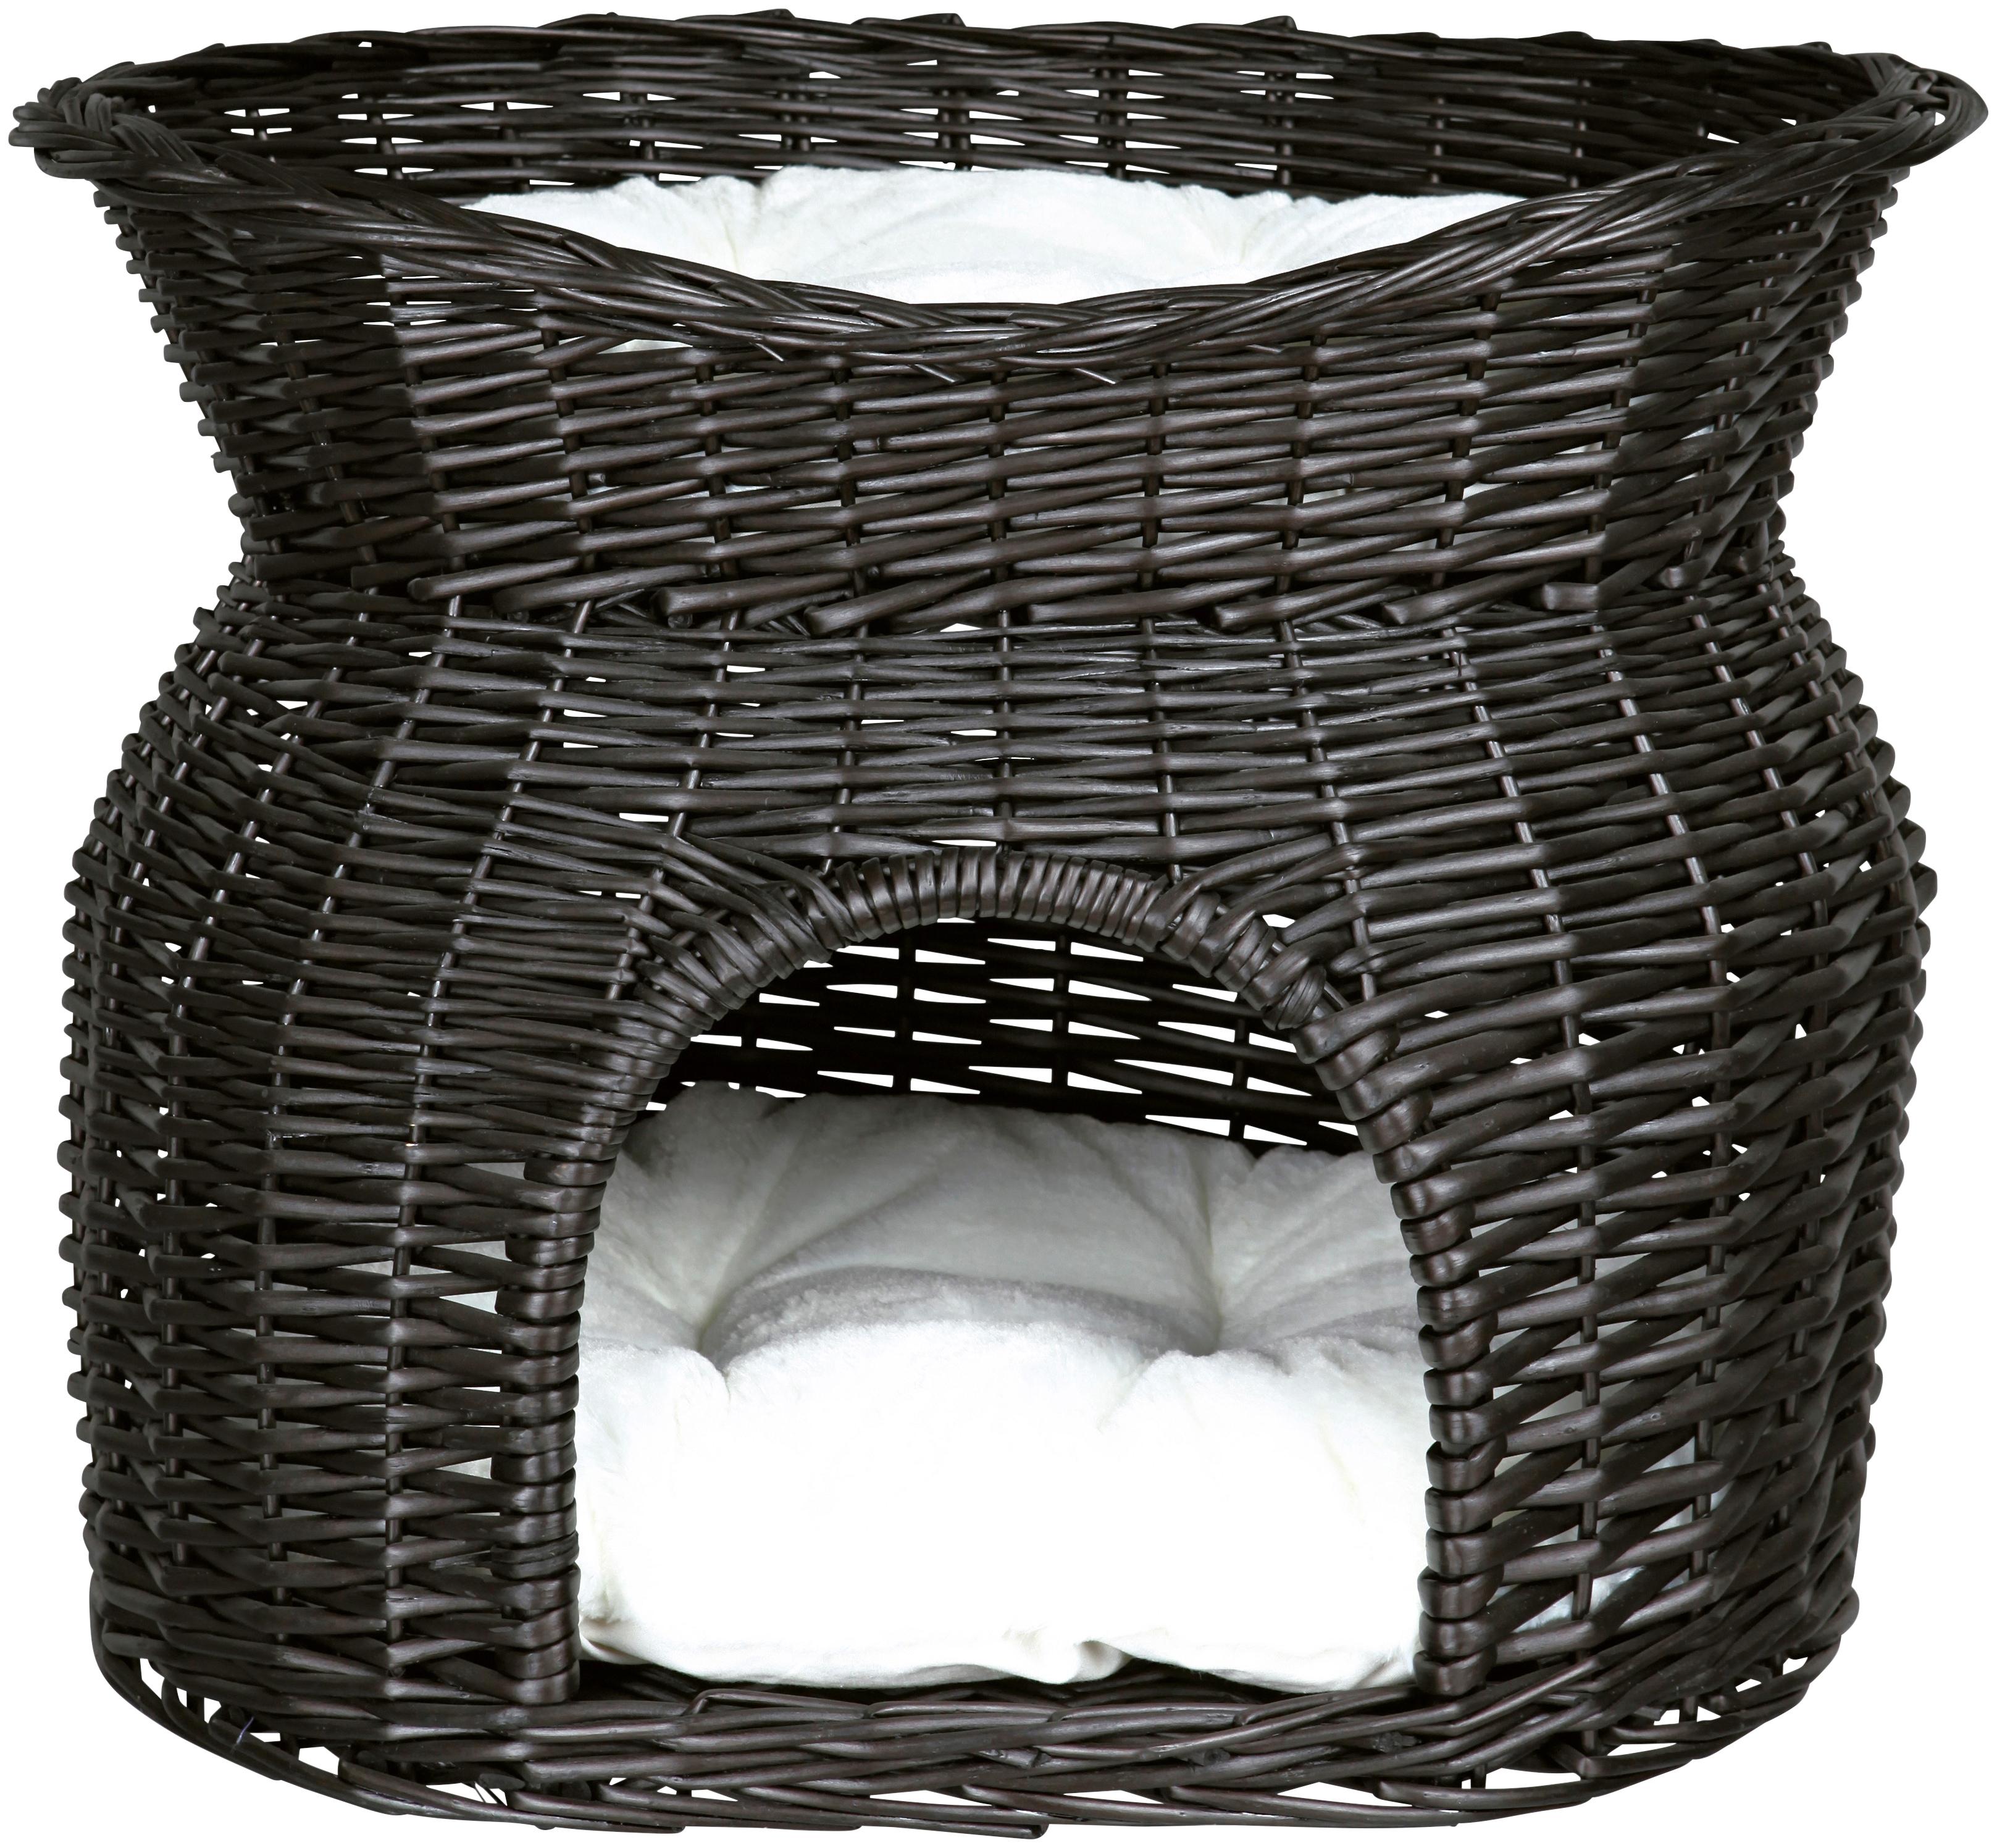 TRIXIE Katzen-Korbturm, B/L/H: 54/43/37 cm, schwarz | Garten > Tiermöbel > Katzenkörbe | Schwarz | TRIXIE